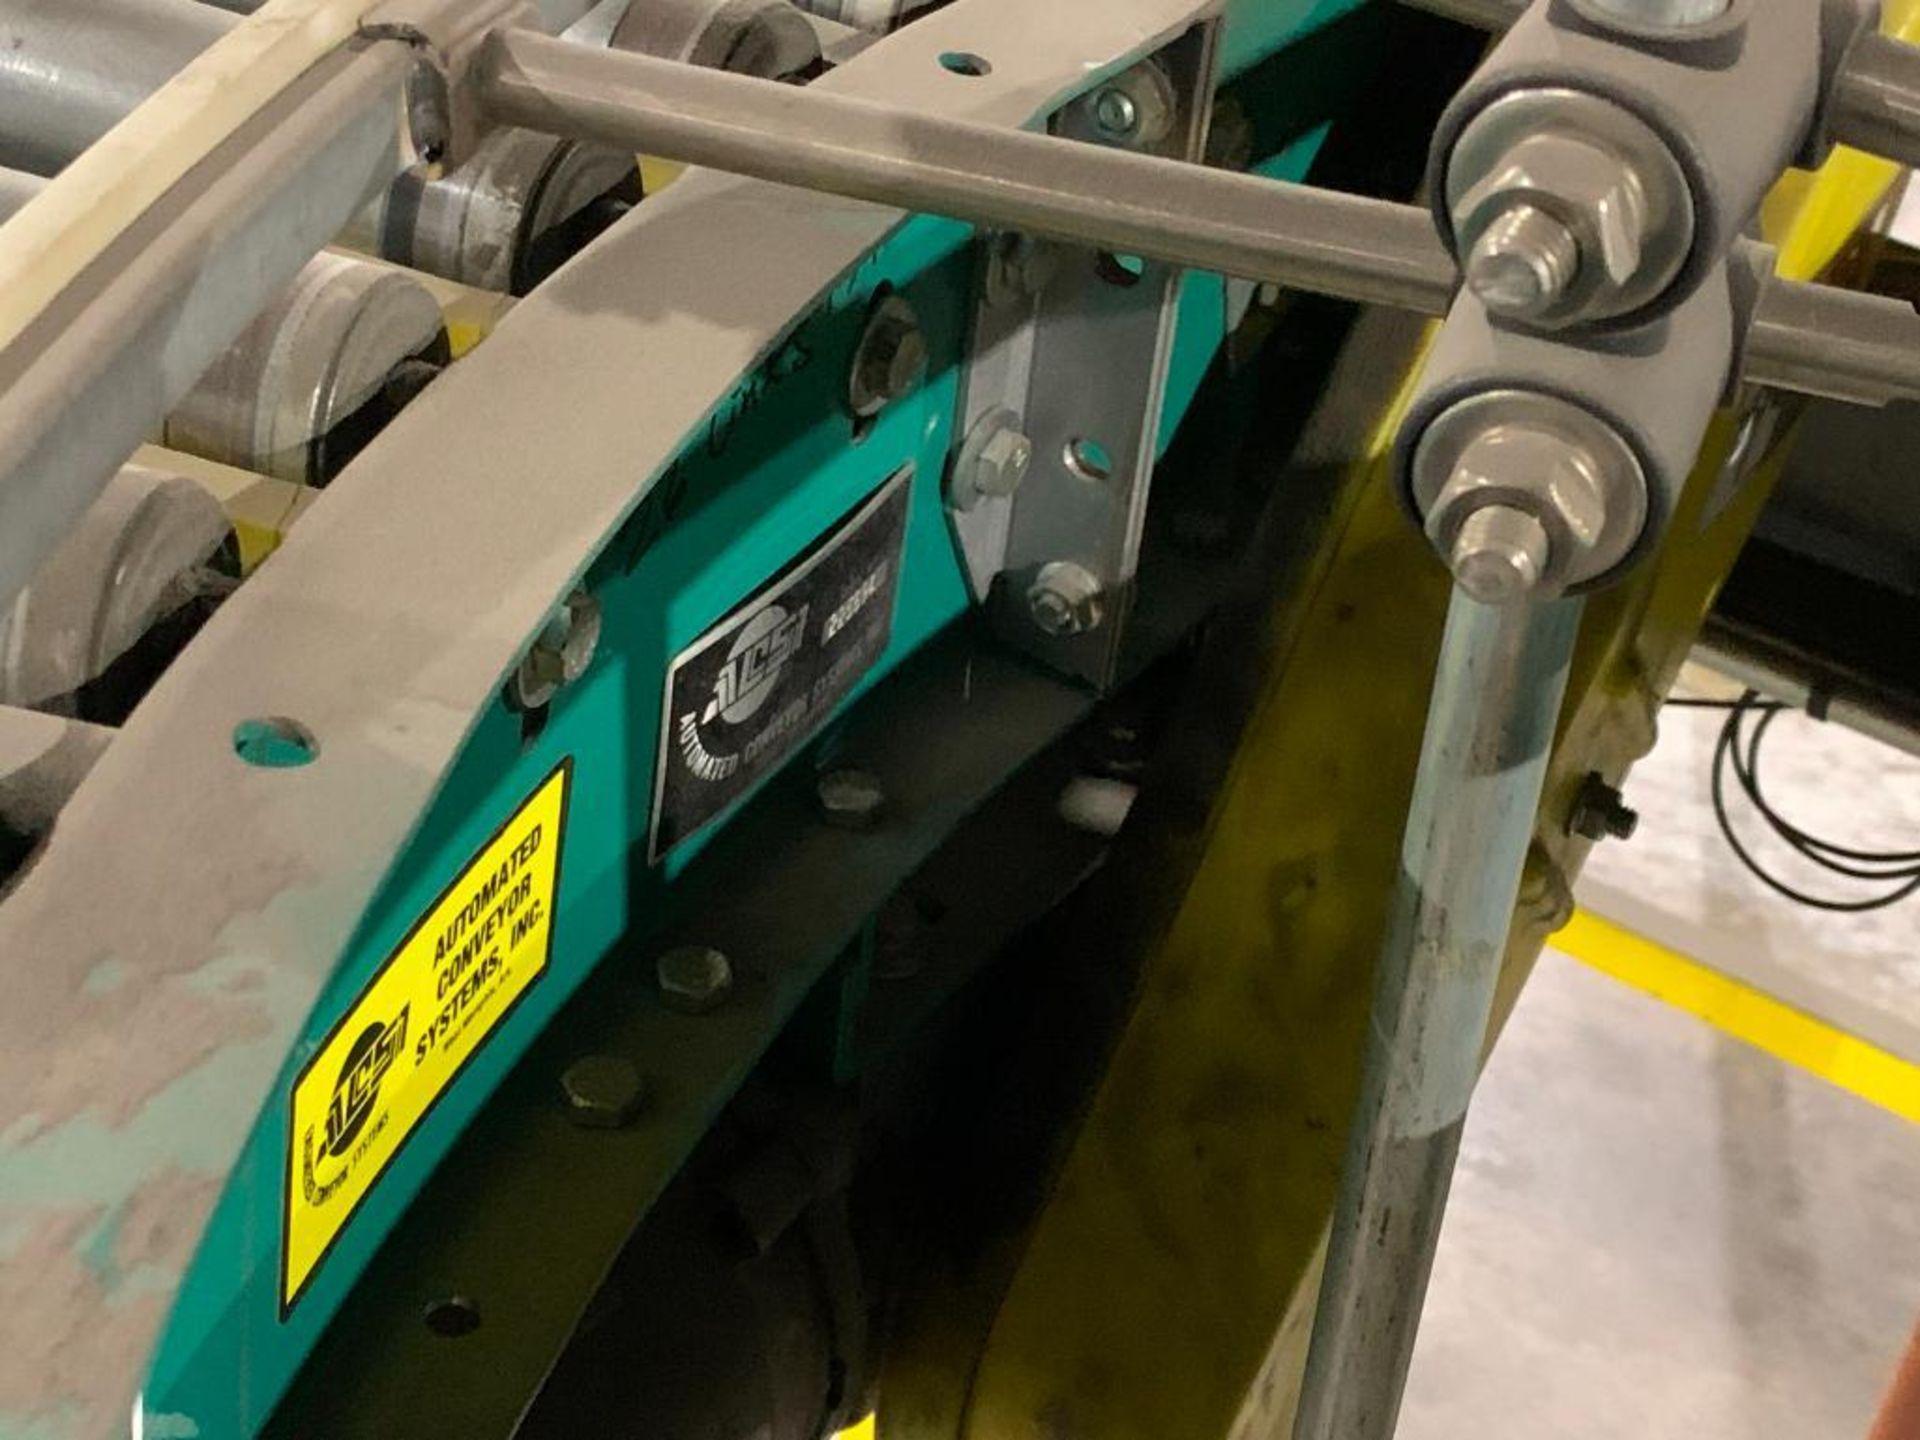 ACS power roller conveyor - Image 11 of 15